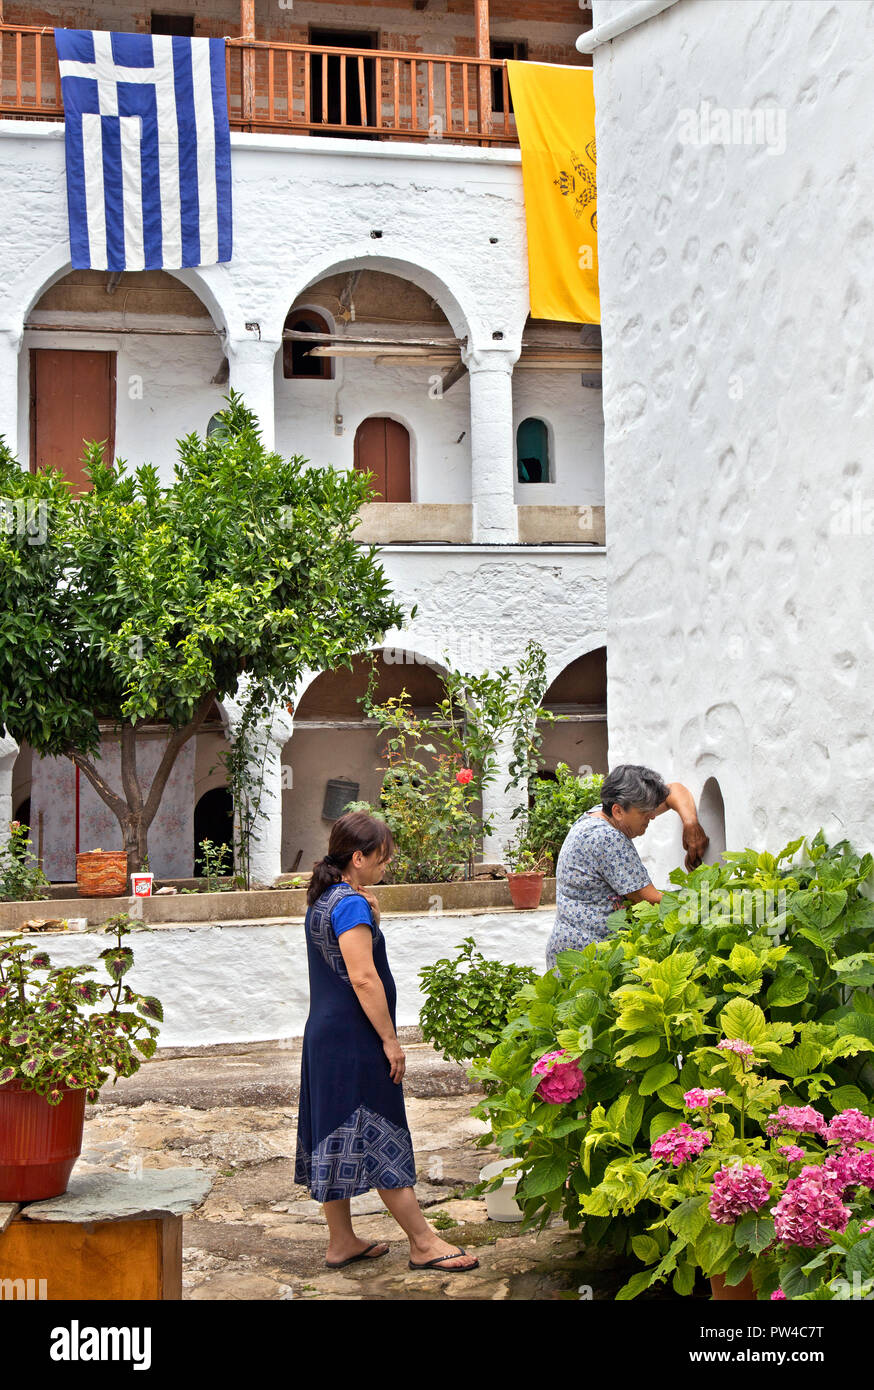 Women cleaning up the courtyard of Timios Prodromos monastery, Palouki mountain, Skopelos island, Northern Sporades, Greece. - Stock Image